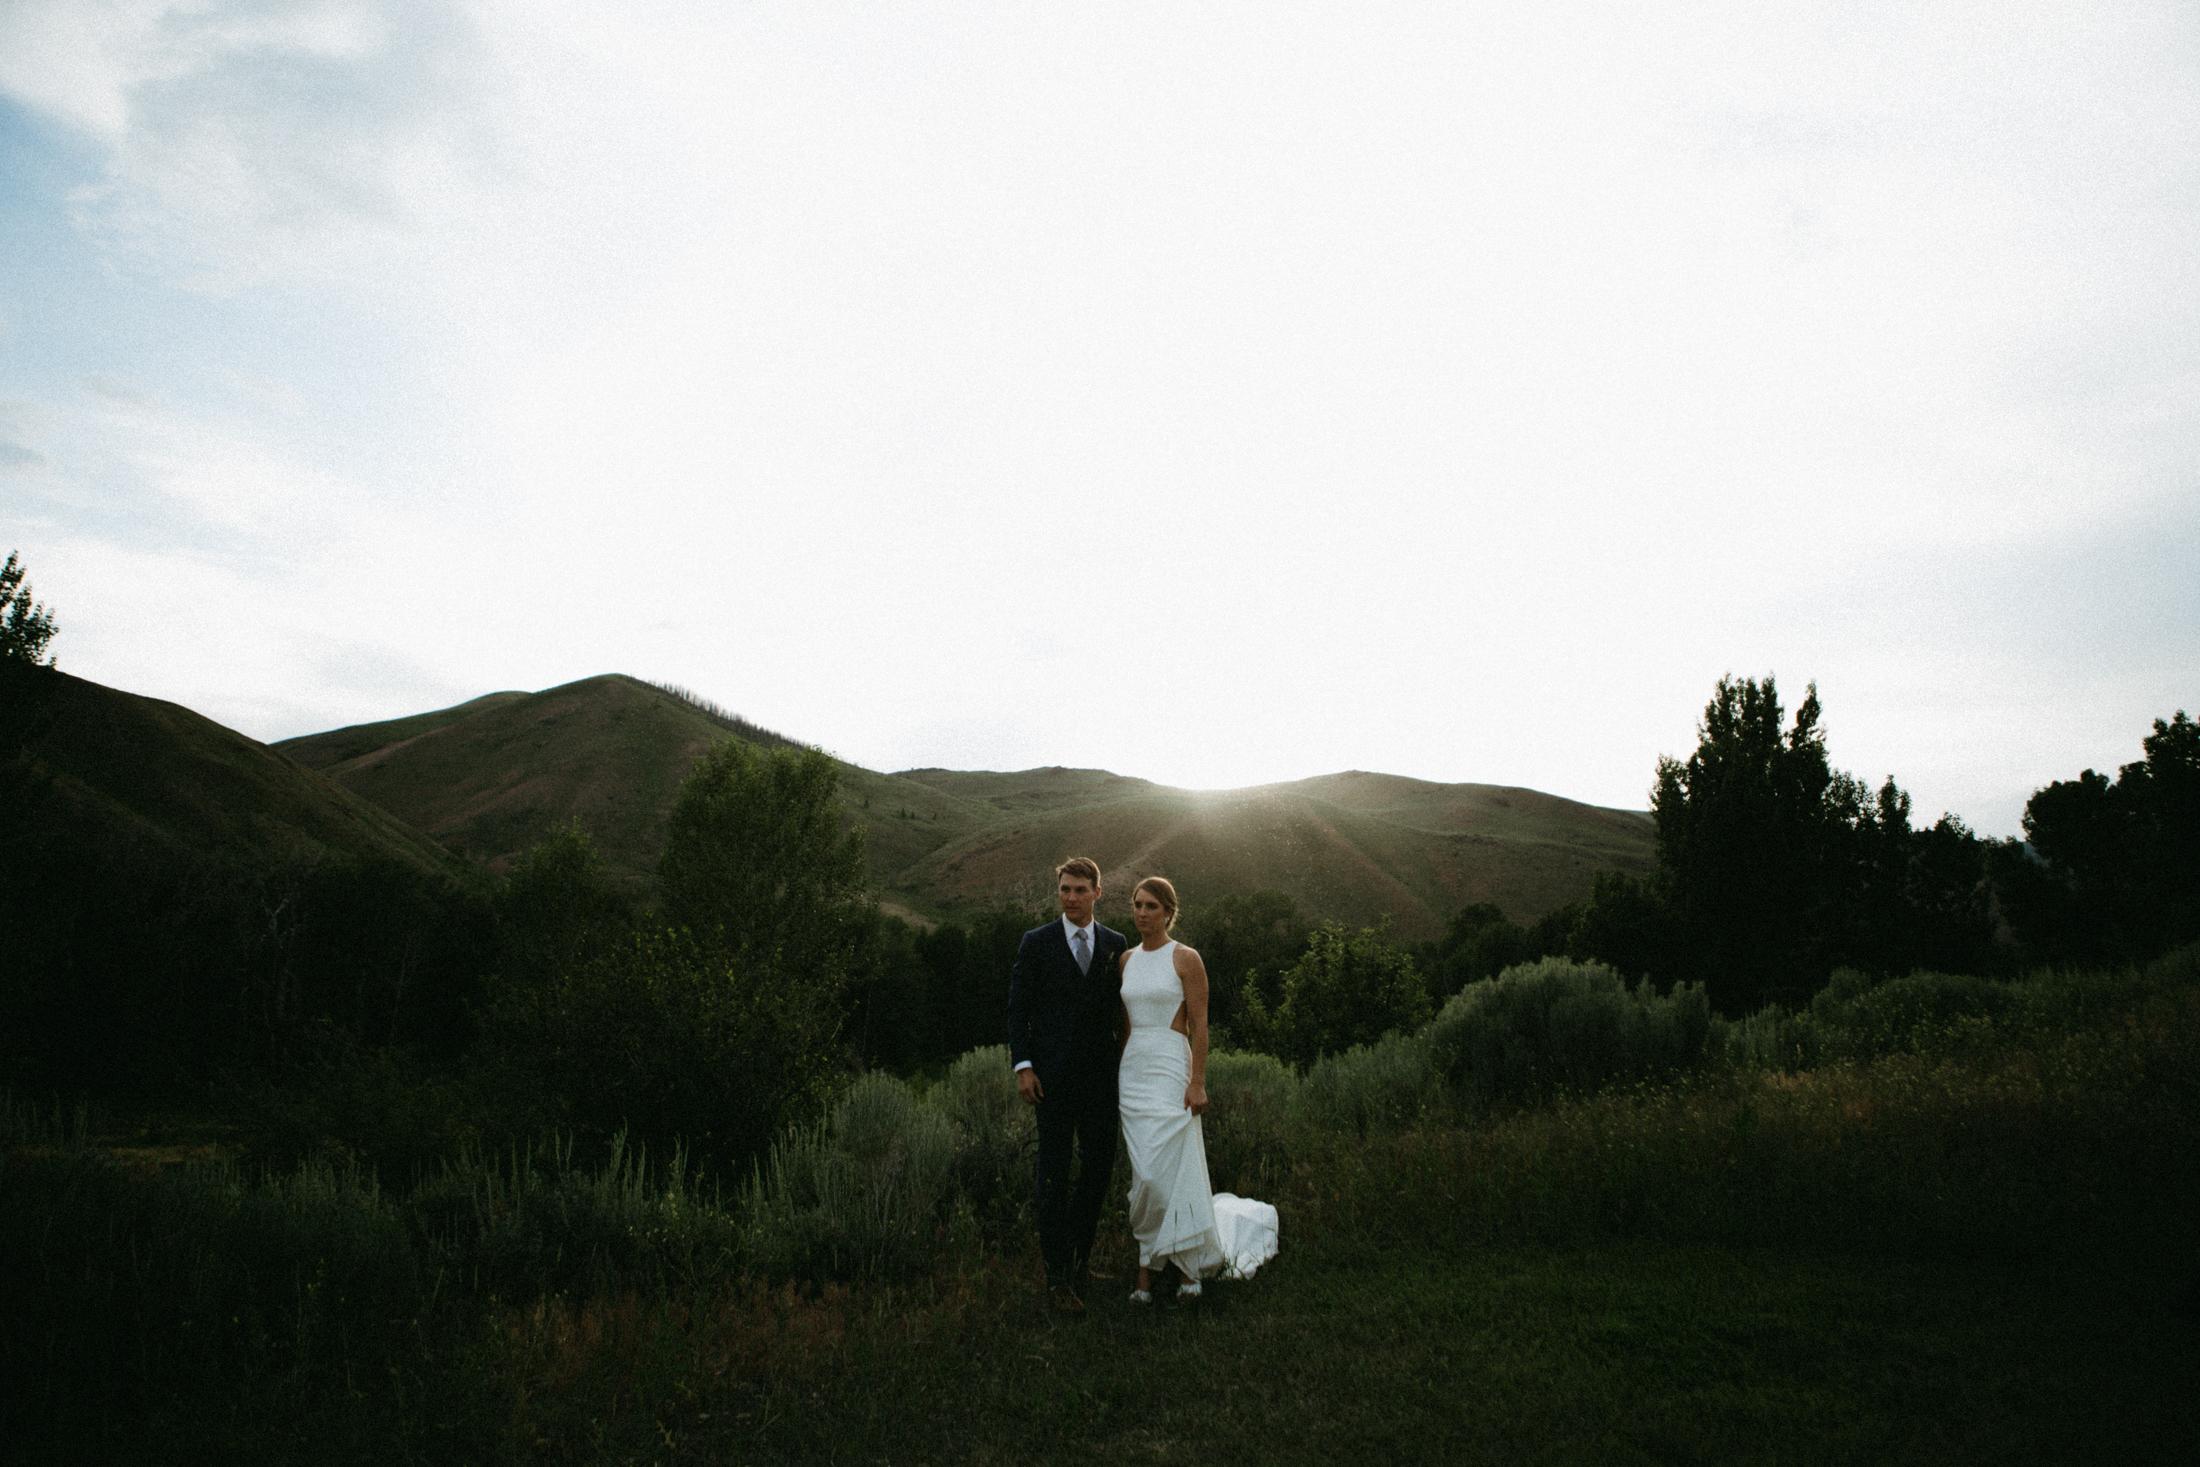 Alexander + Olivia | The Homestead Wedding